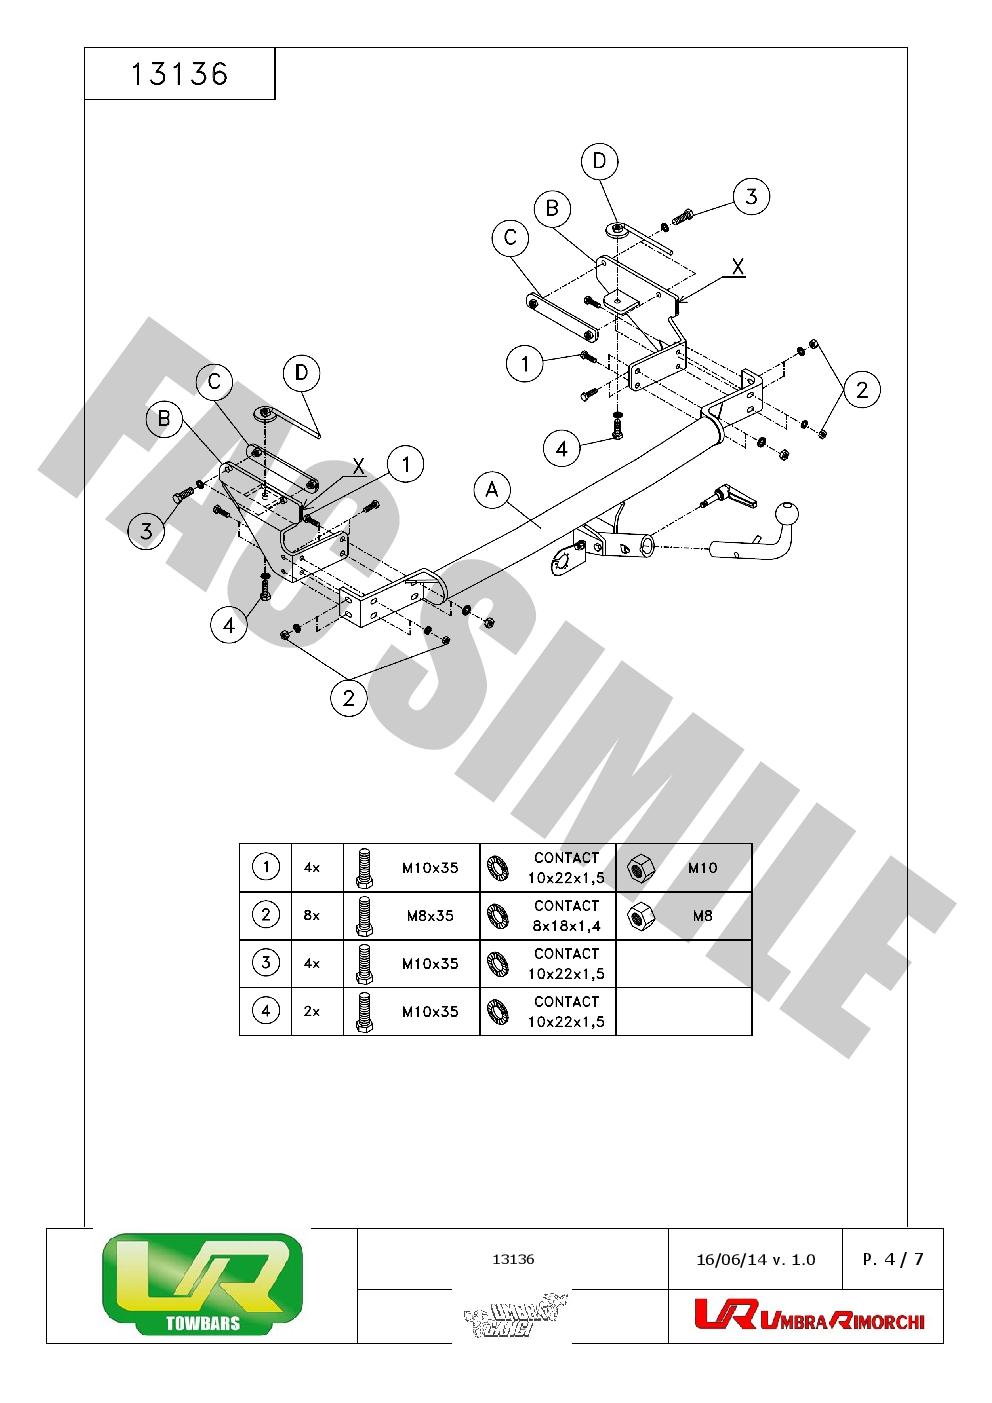 Detachable Towbar + 7pin Electrics for Fiat Stilo Hatch 3